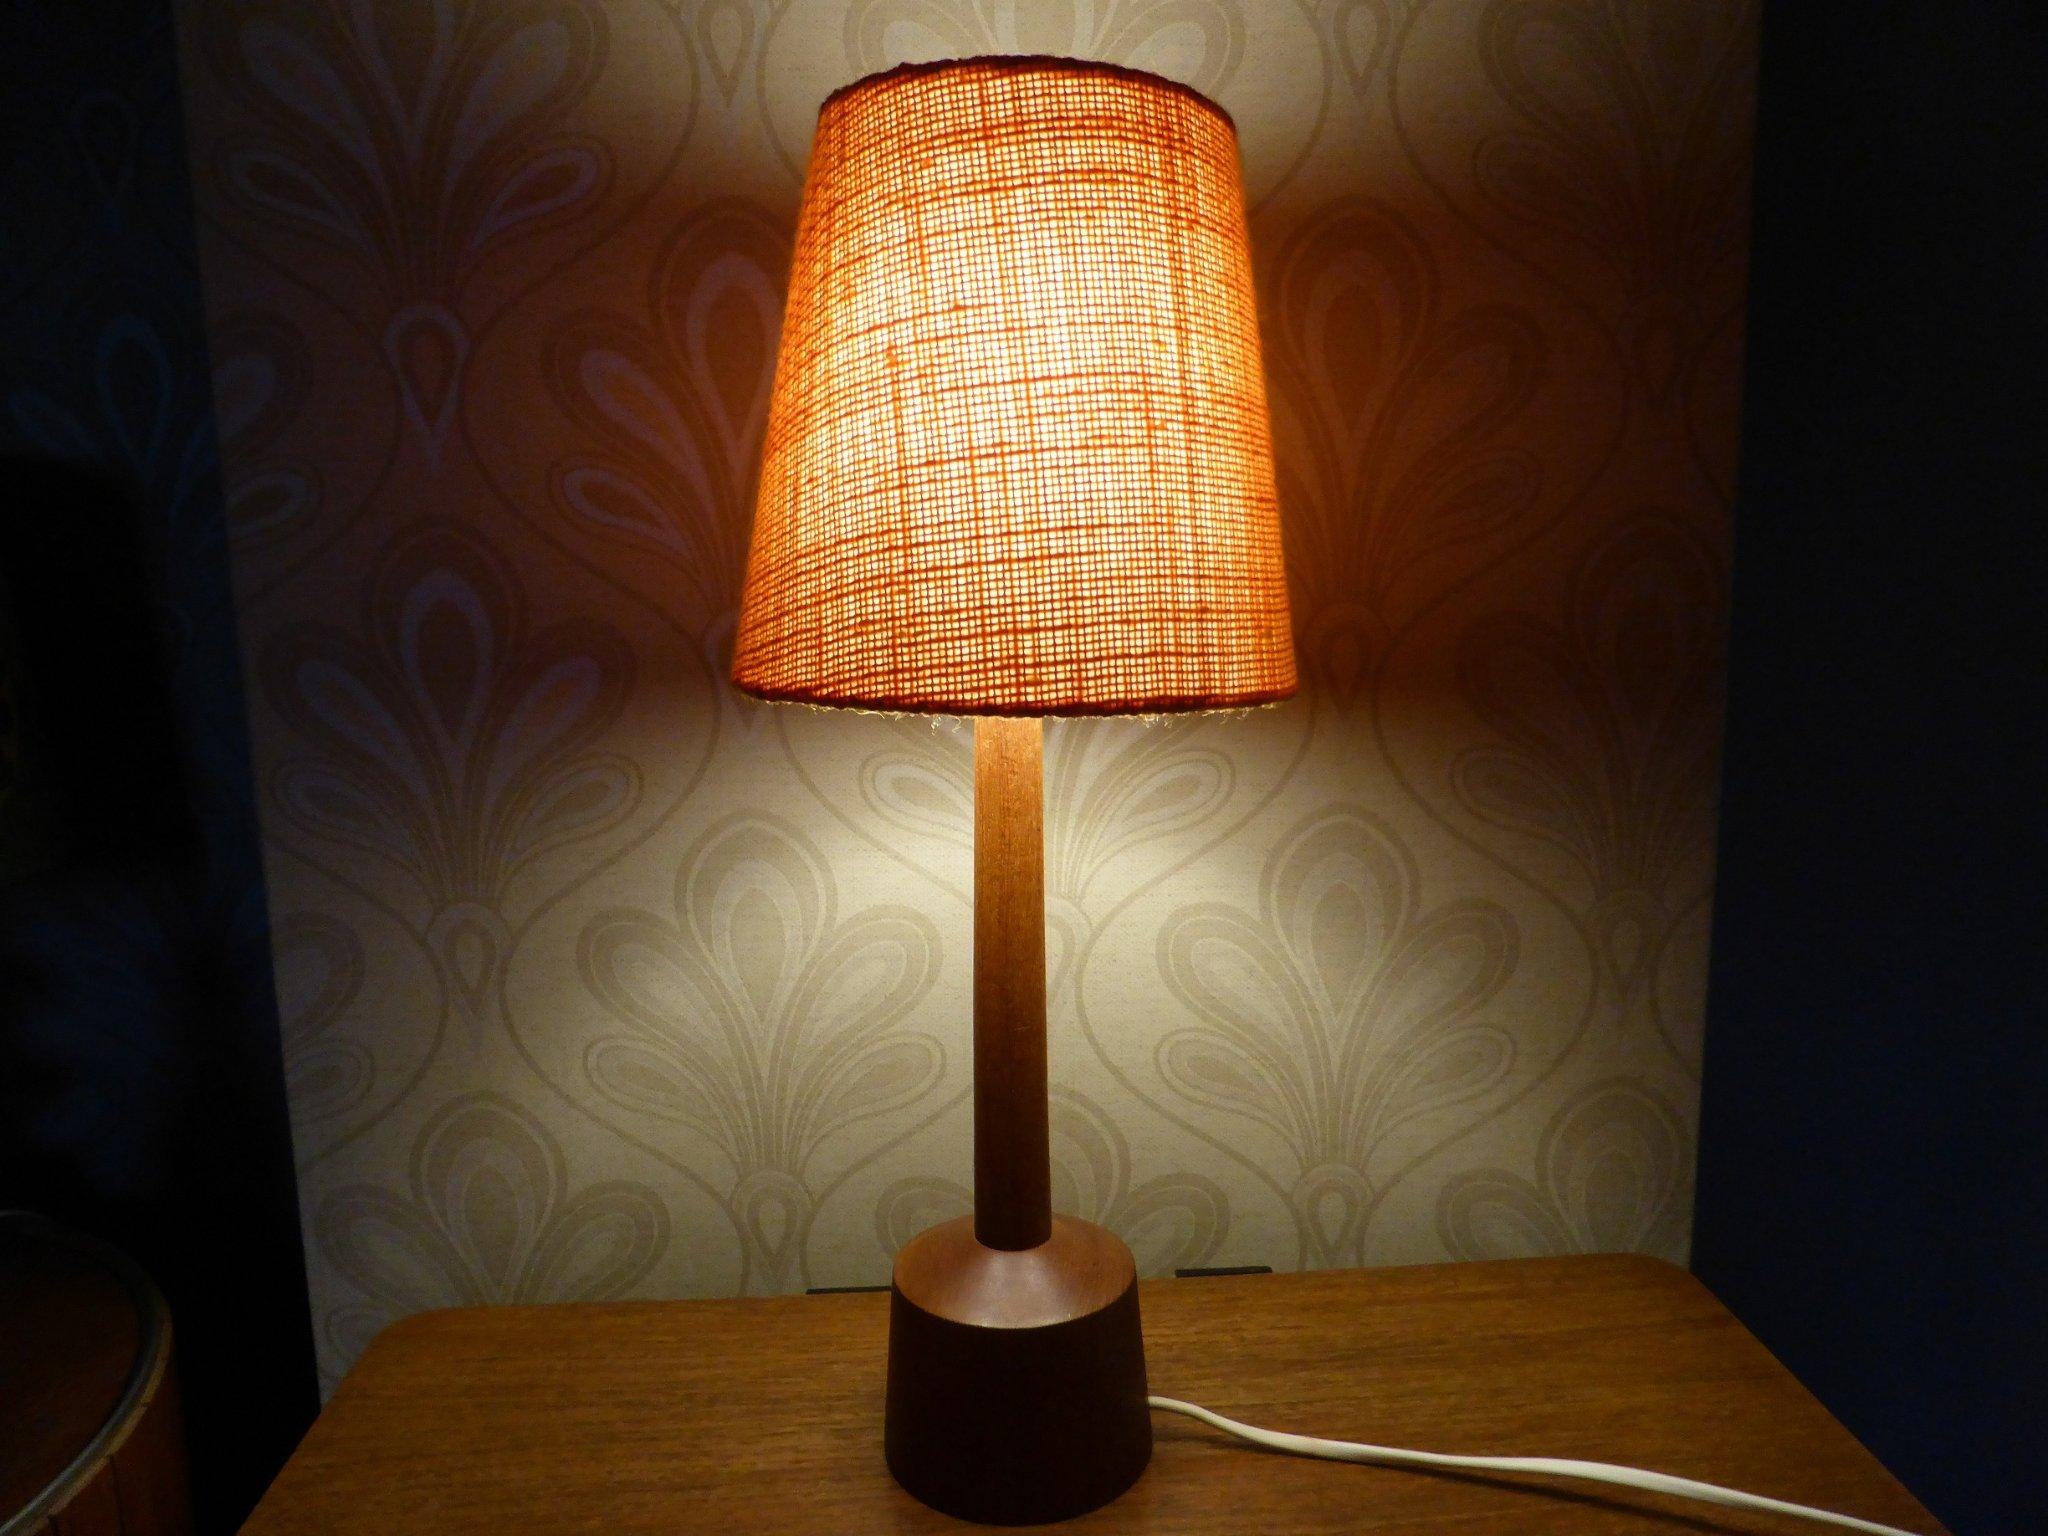 retro lampa i teak med orange skärm